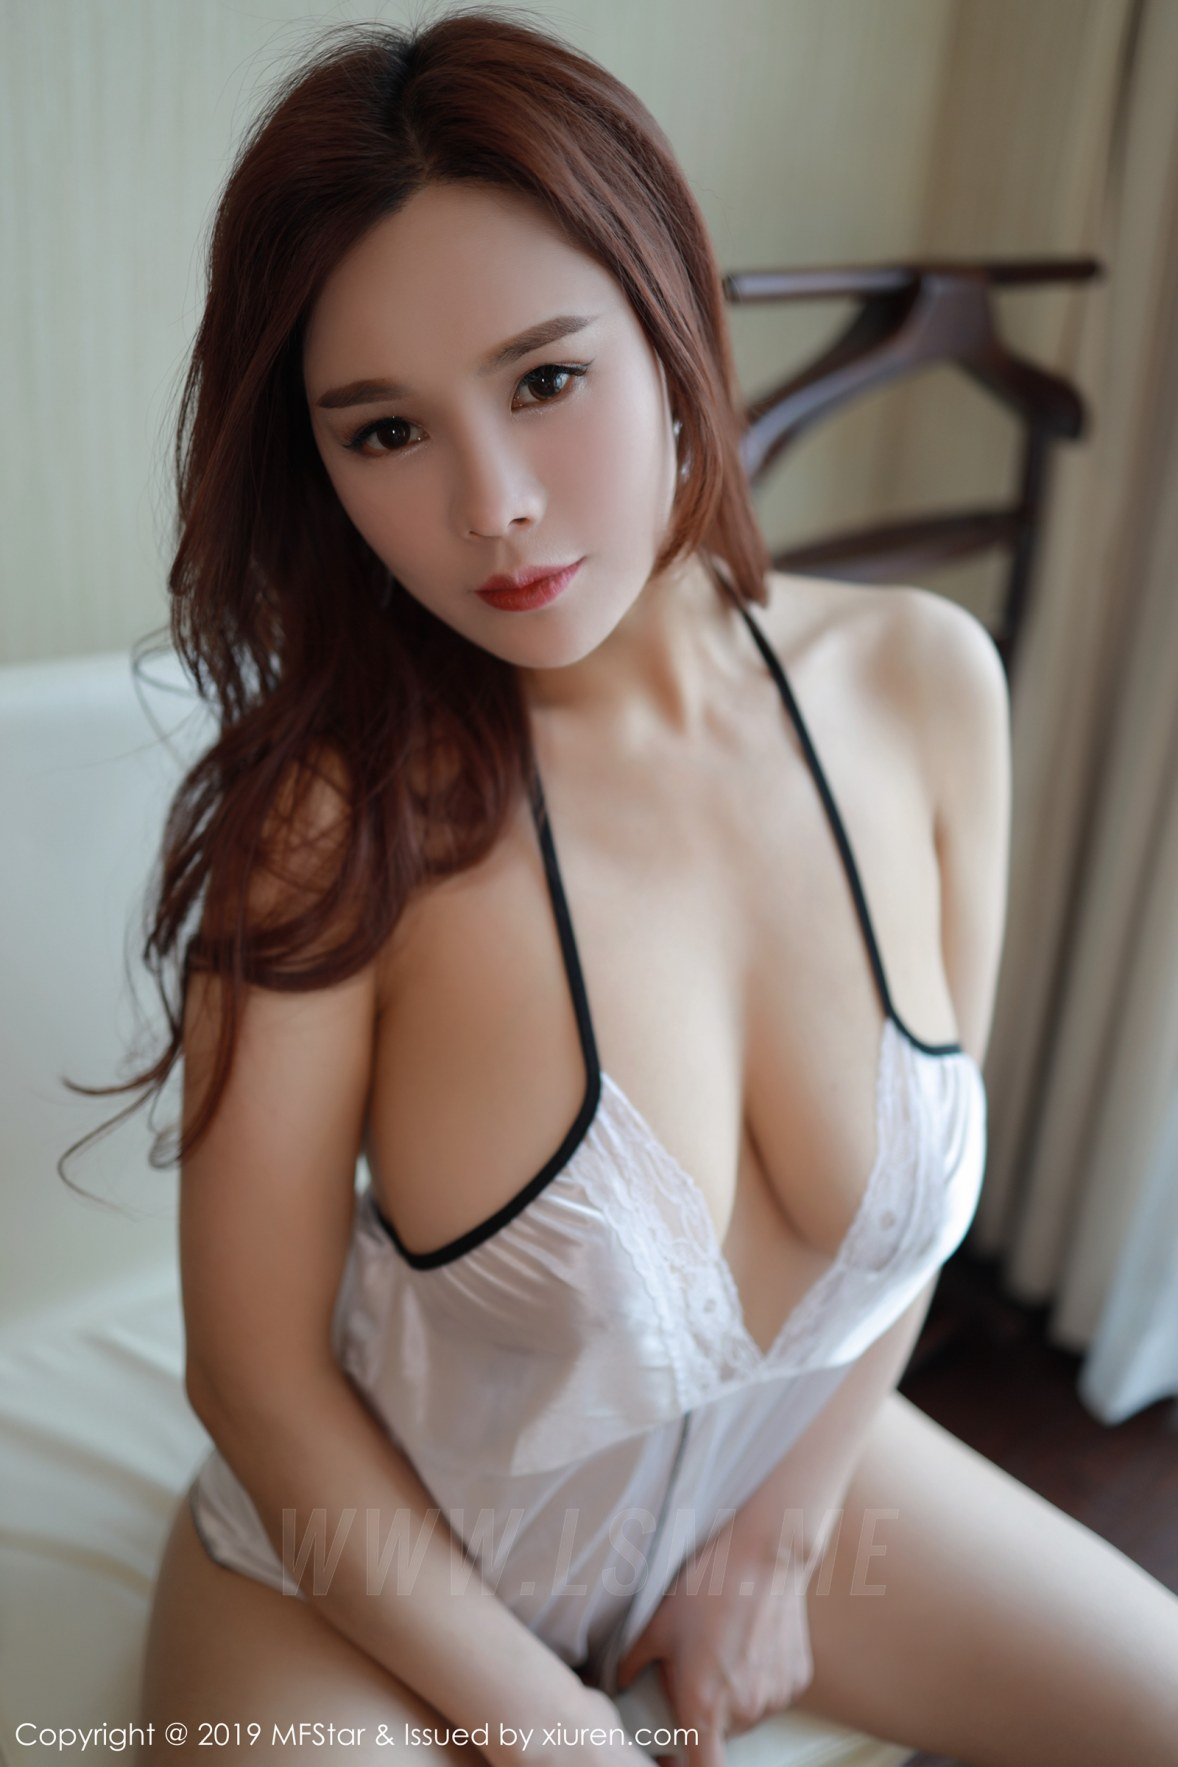 MFStar 模范学院 Vol.185 胡润曦201712  身材丰腴 - 4